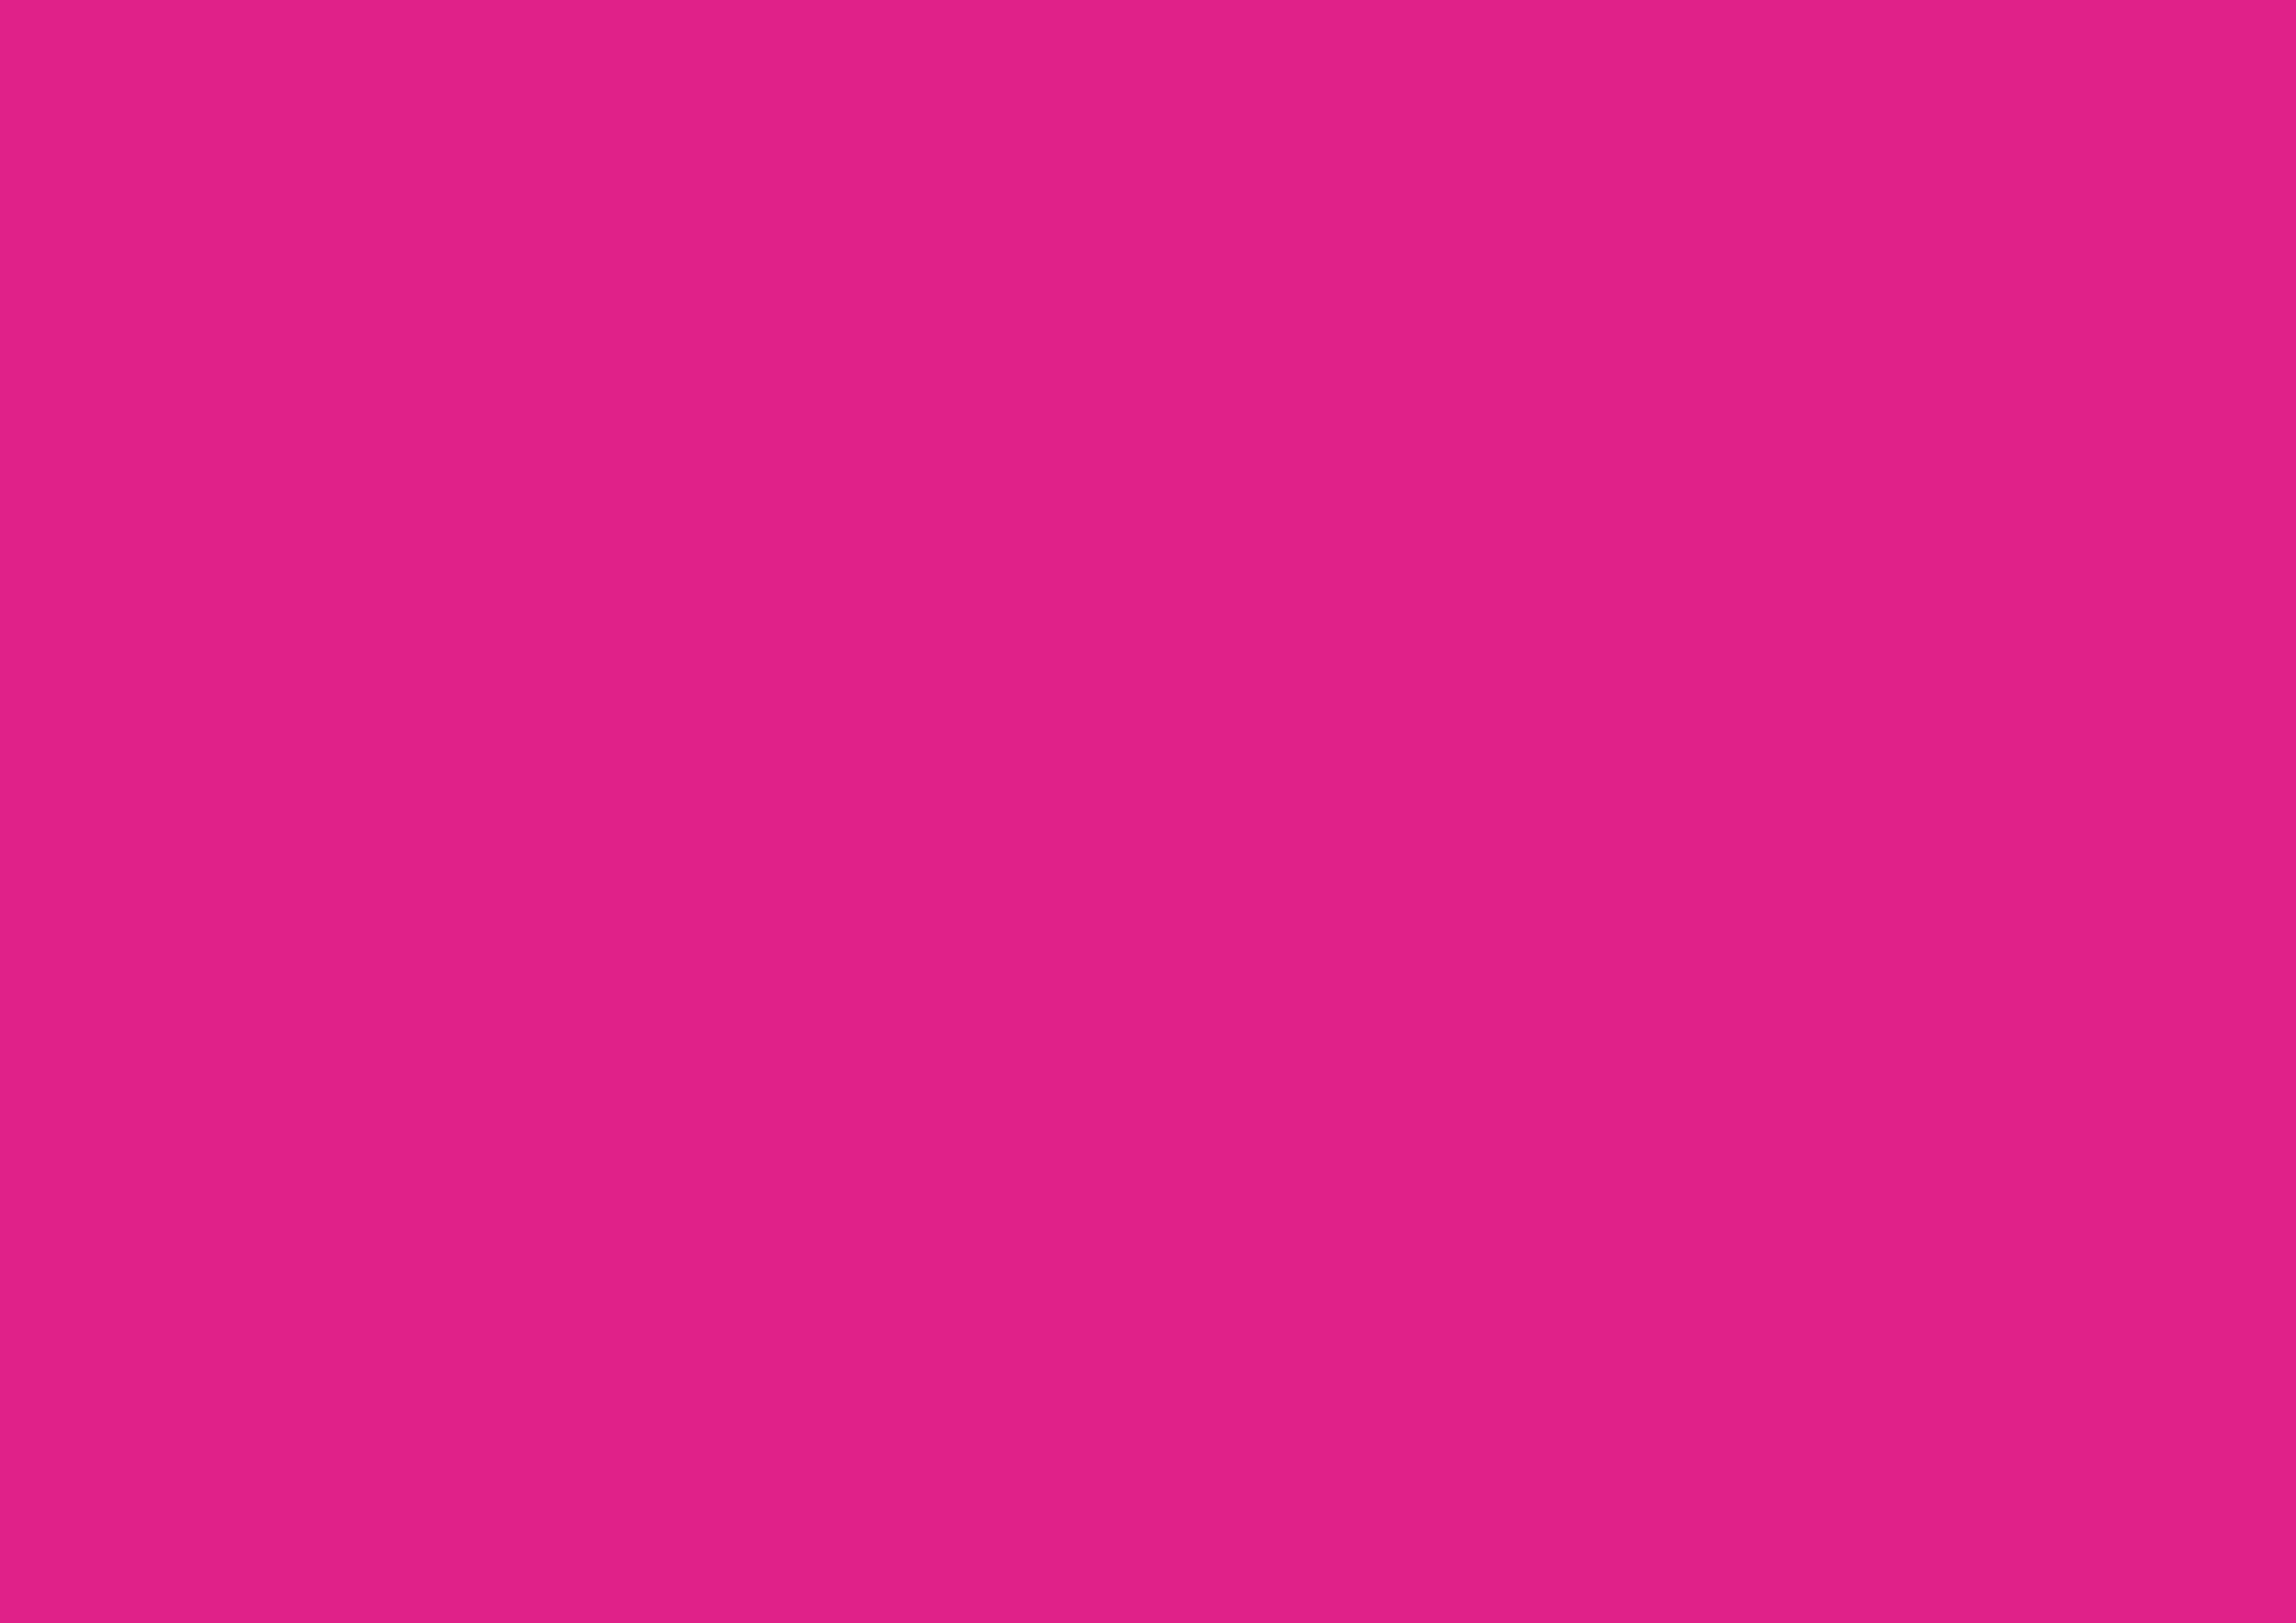 3508x2480 Barbie Pink Solid Color Background